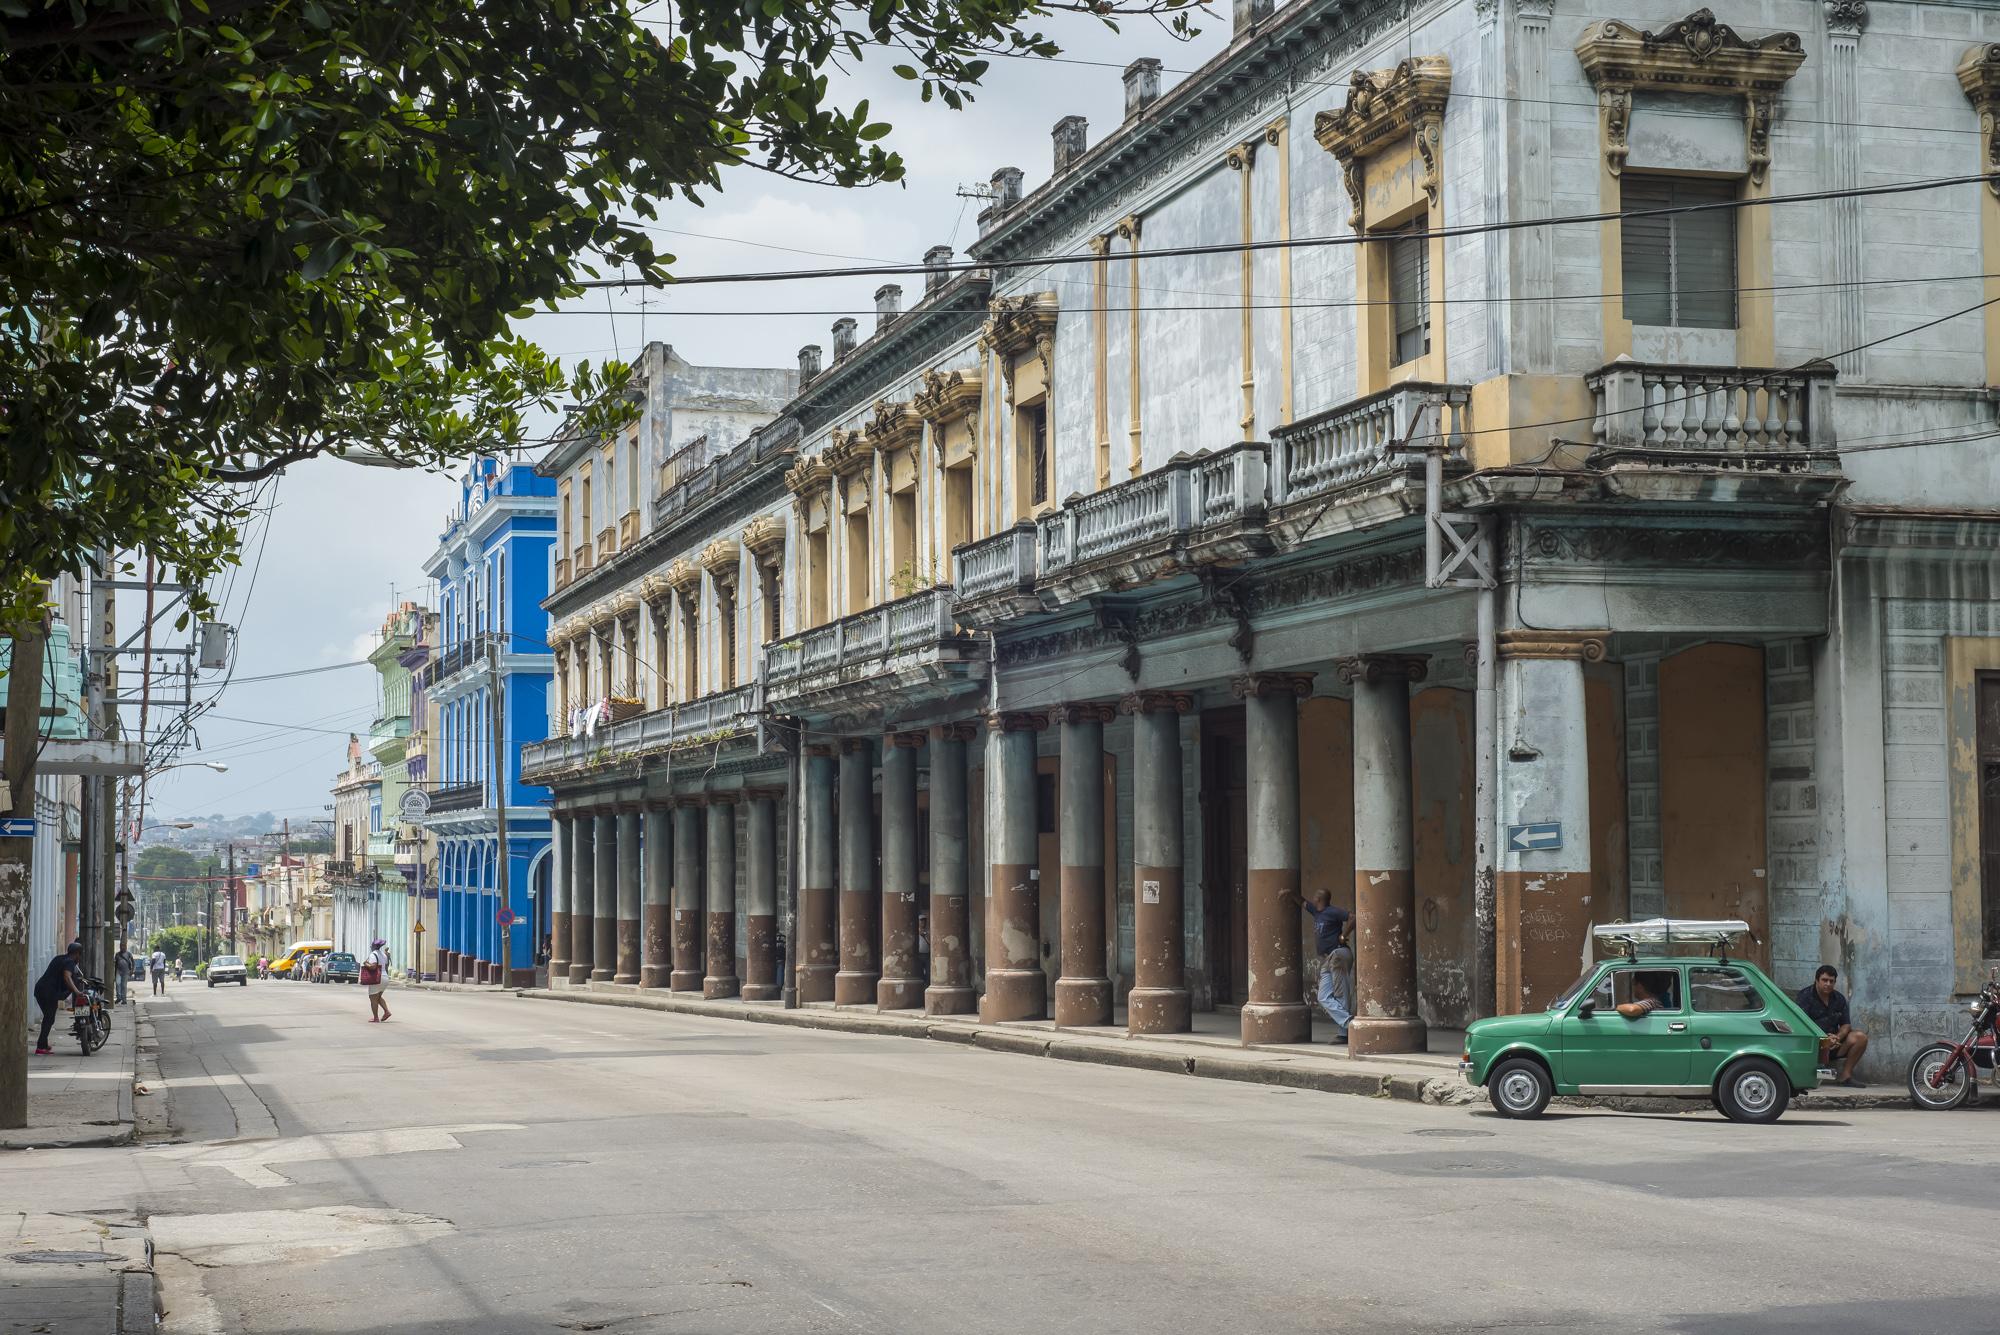 A typical street in Havana